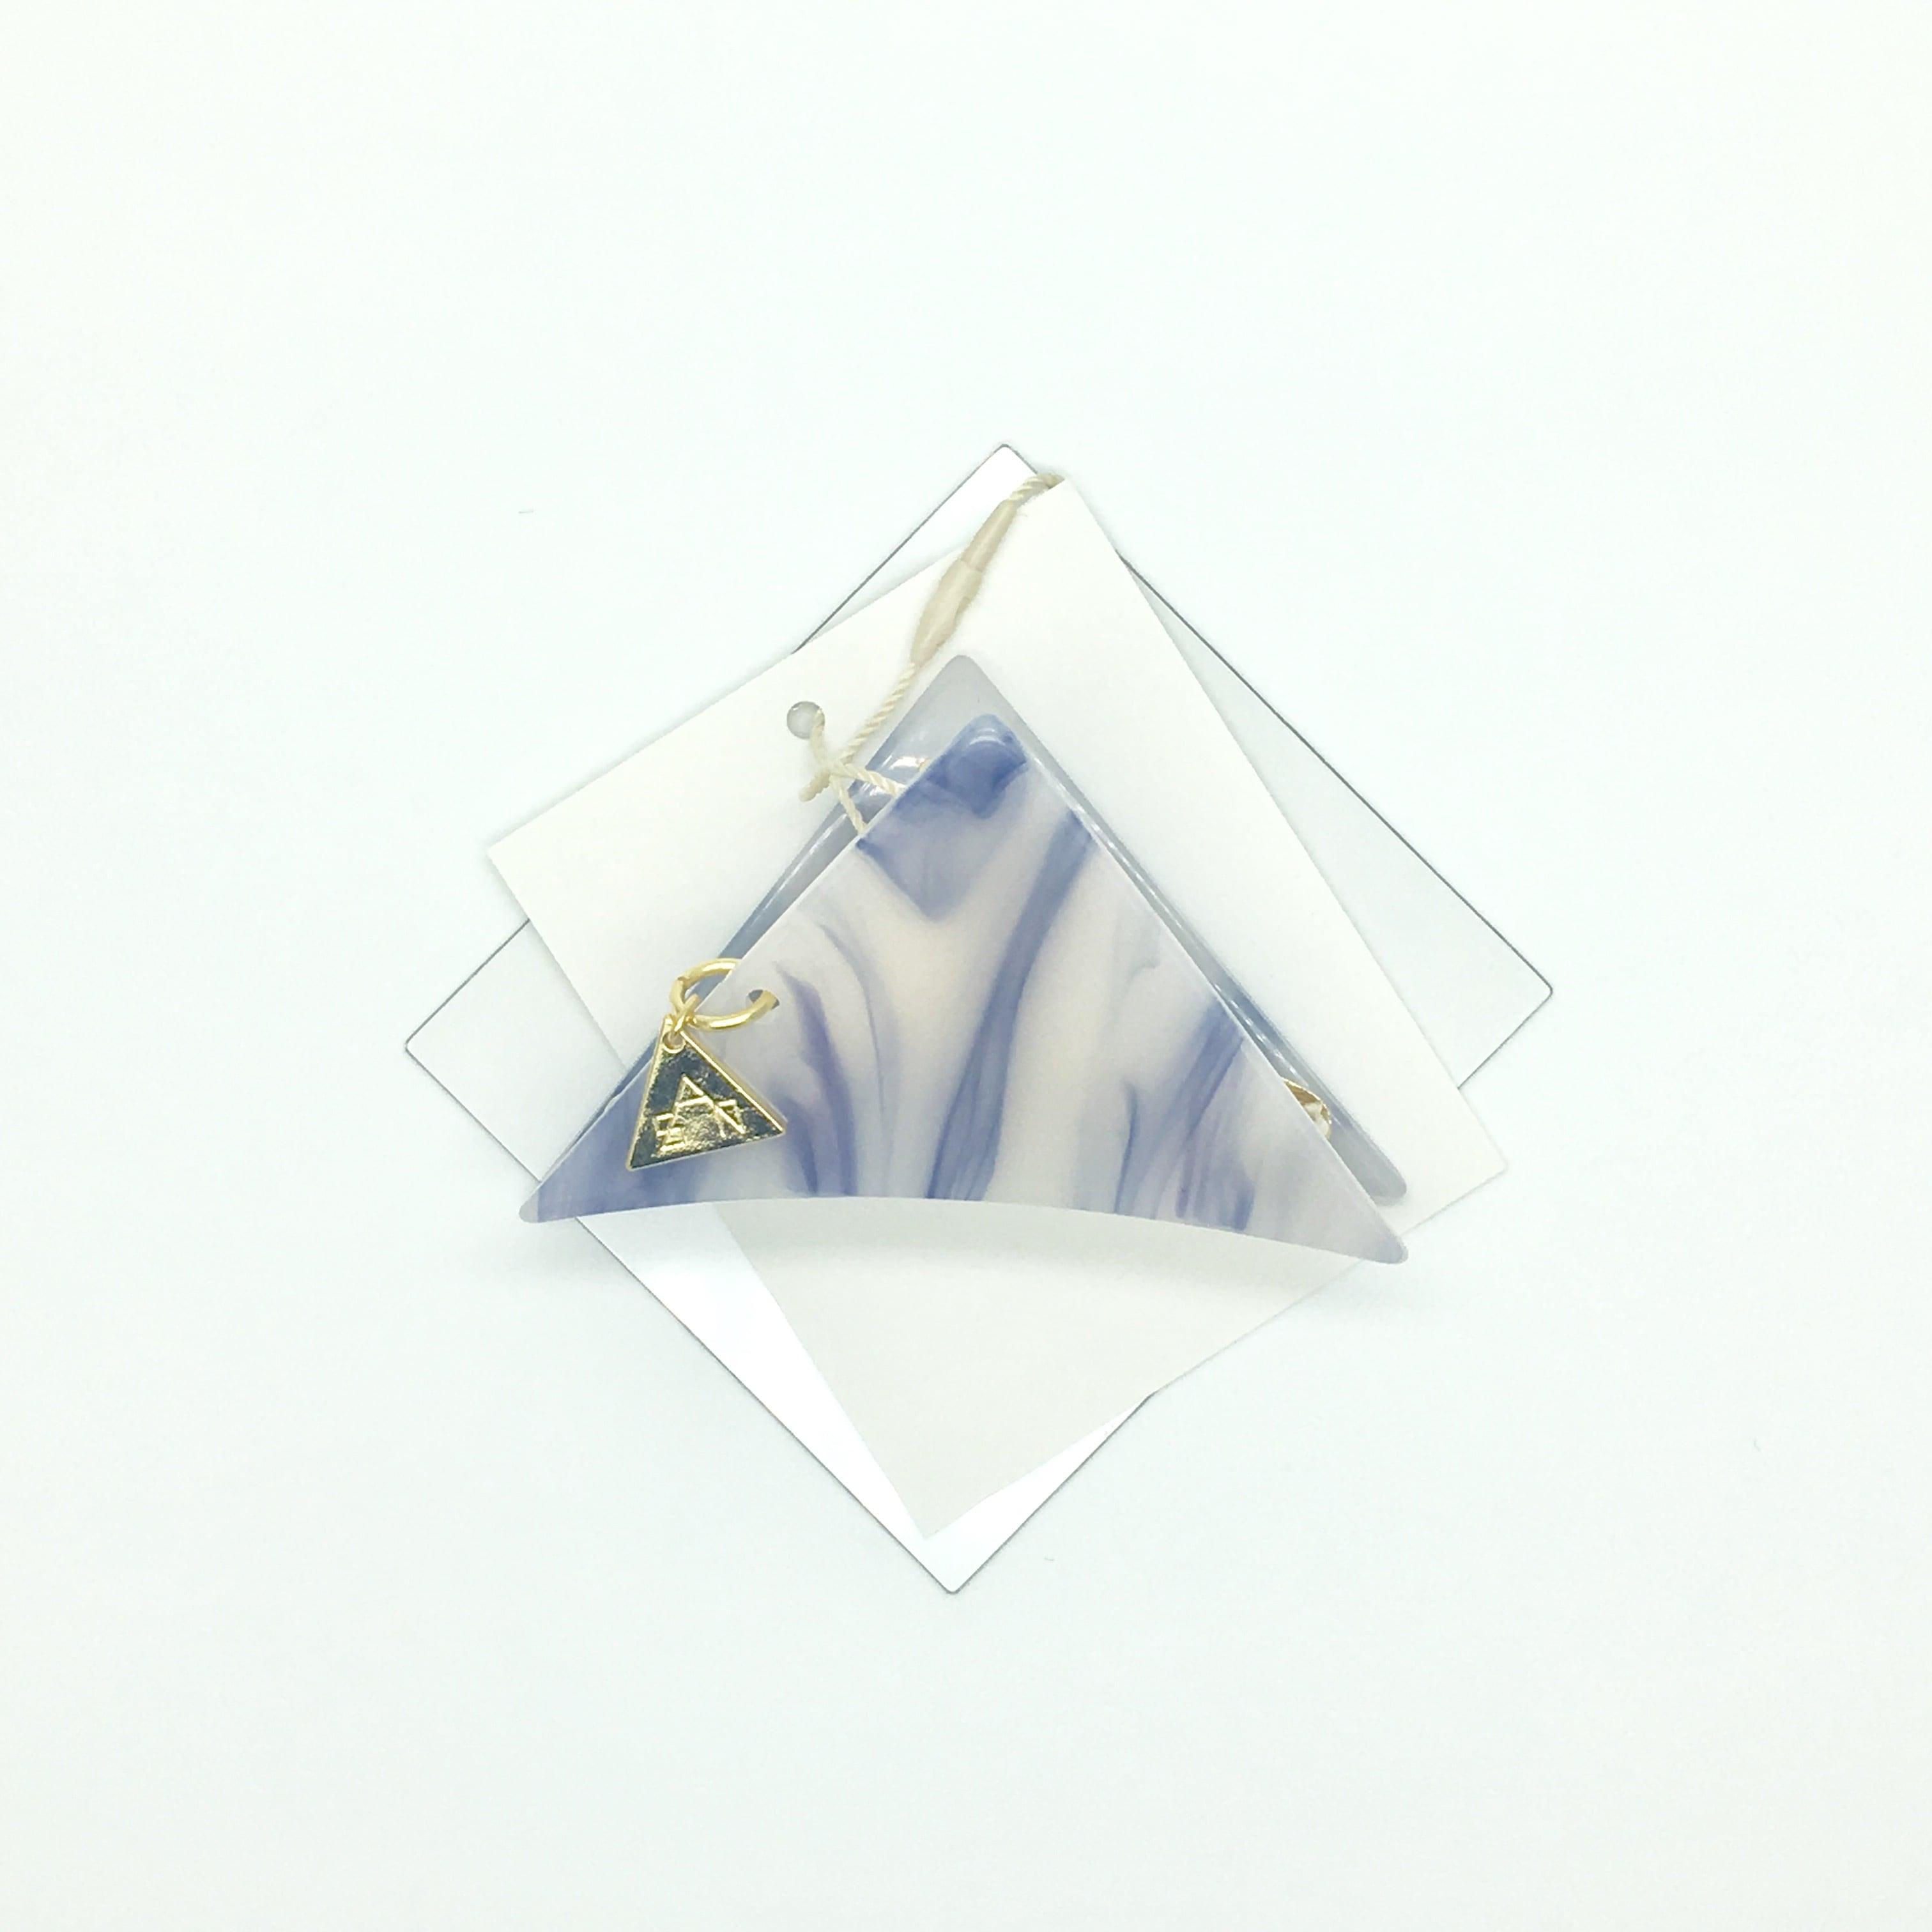 sAn 三角クリップSサイズ ネイビー